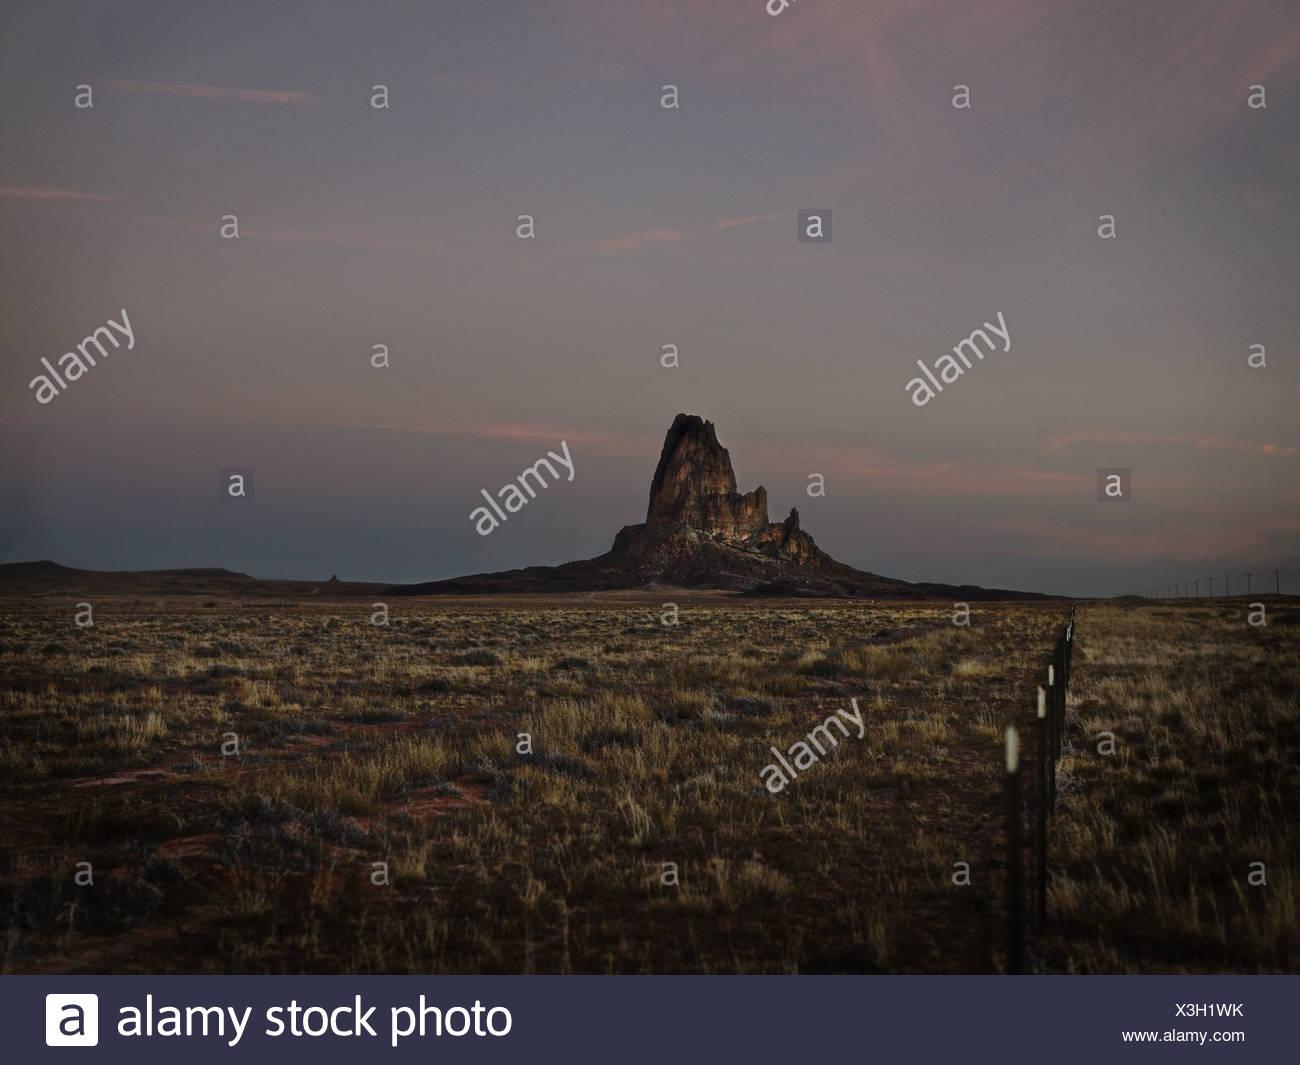 Rock formation in grassy desert - Stock Image